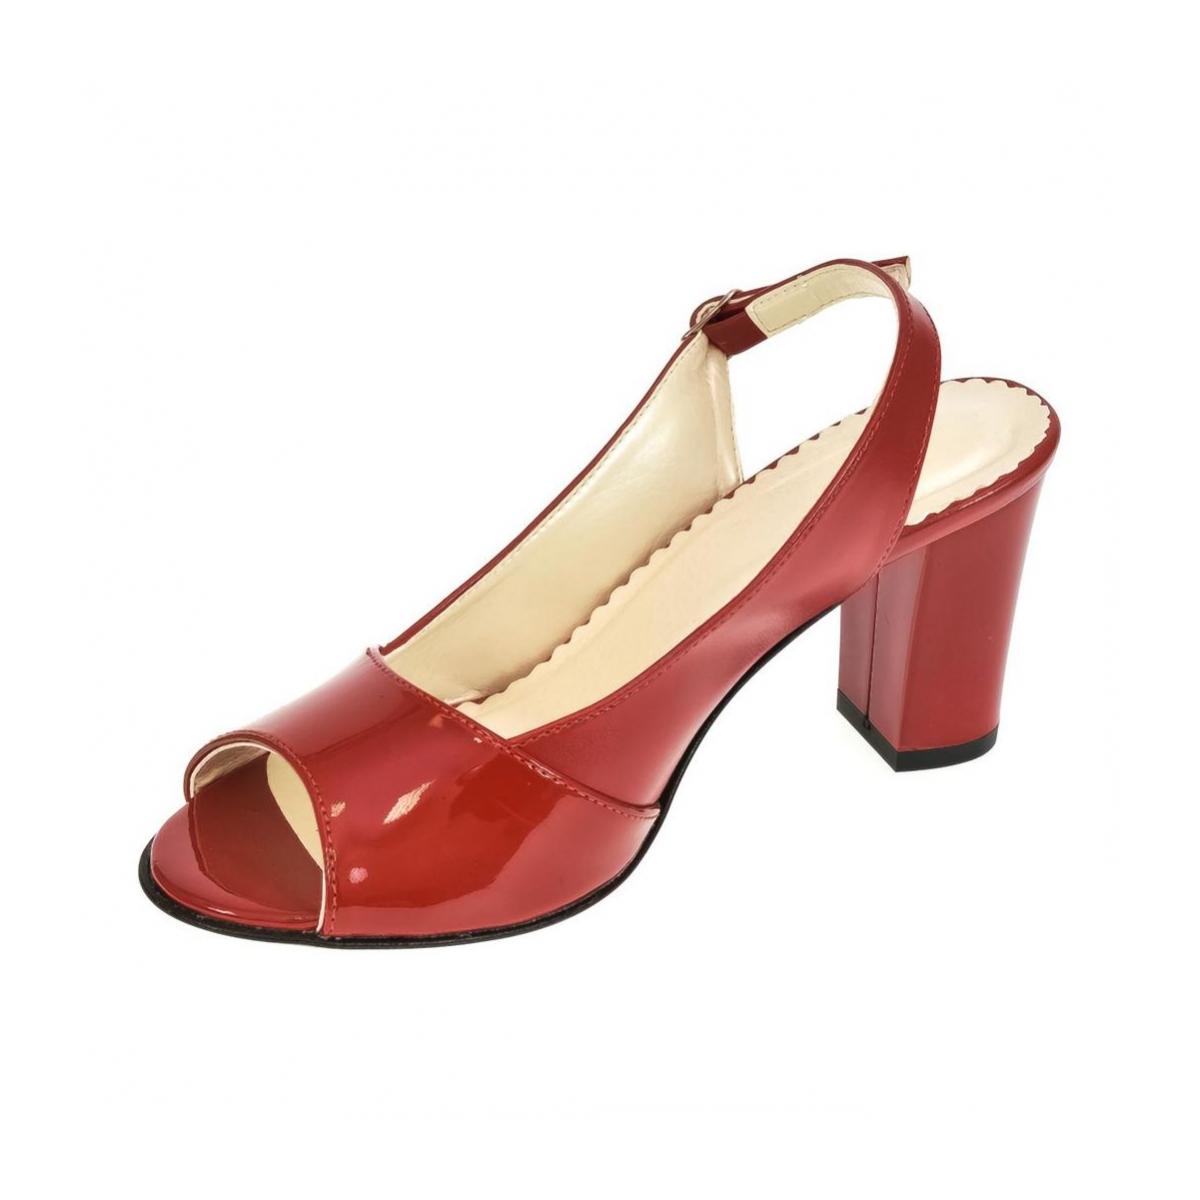 93a267311727 Dámske červené sandále SAINA - 6